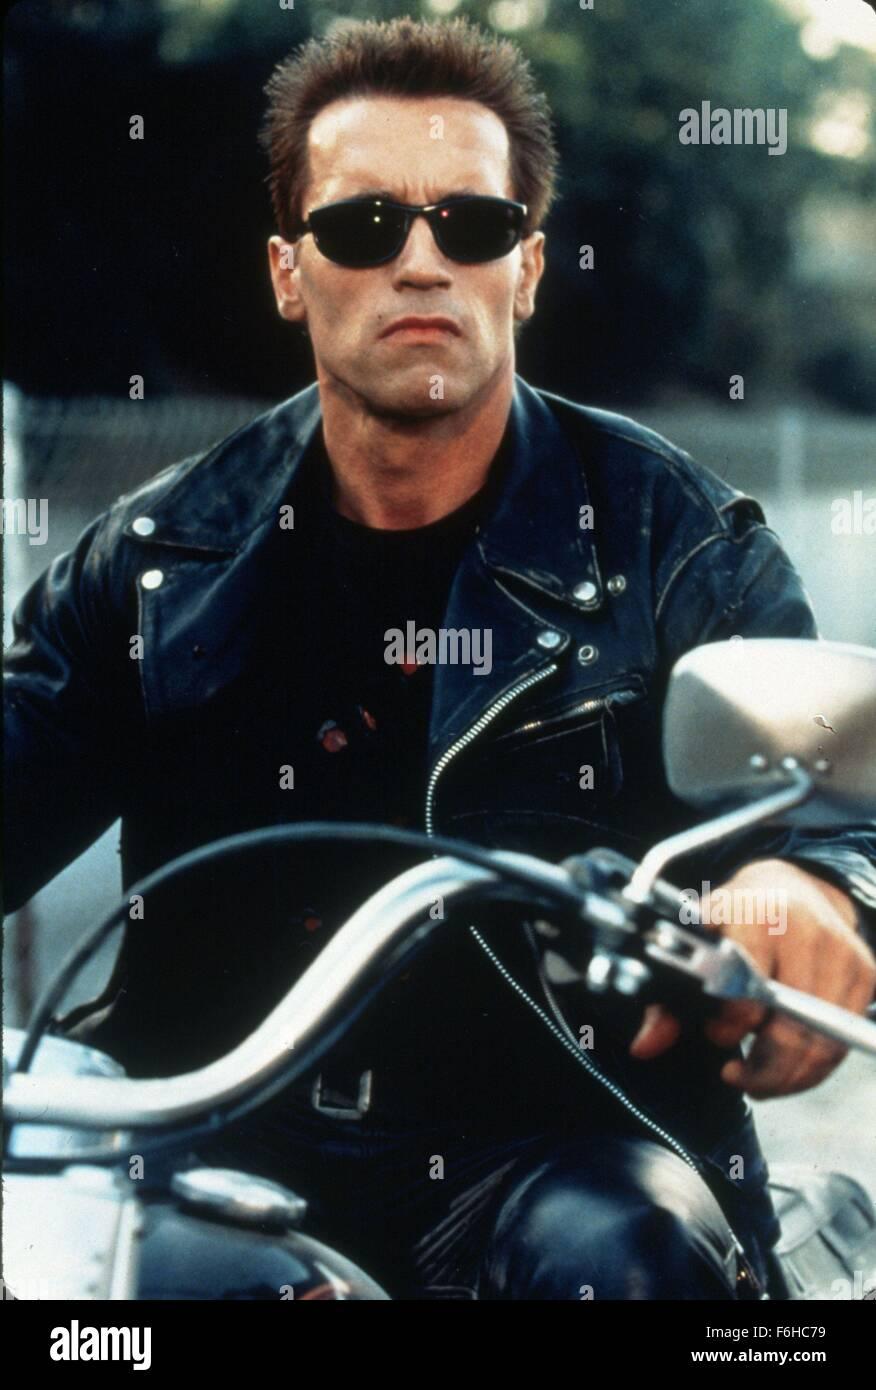 47d90e0de52 1991, Film Title: TERMINATOR 2: JUDGEMENT DAY, Pictured: ACCESSORIES,  MOTORCYCLE, ARNOLD SCHWARZENEGGER, SUNGLASSES. (Credit Image: SNAP)